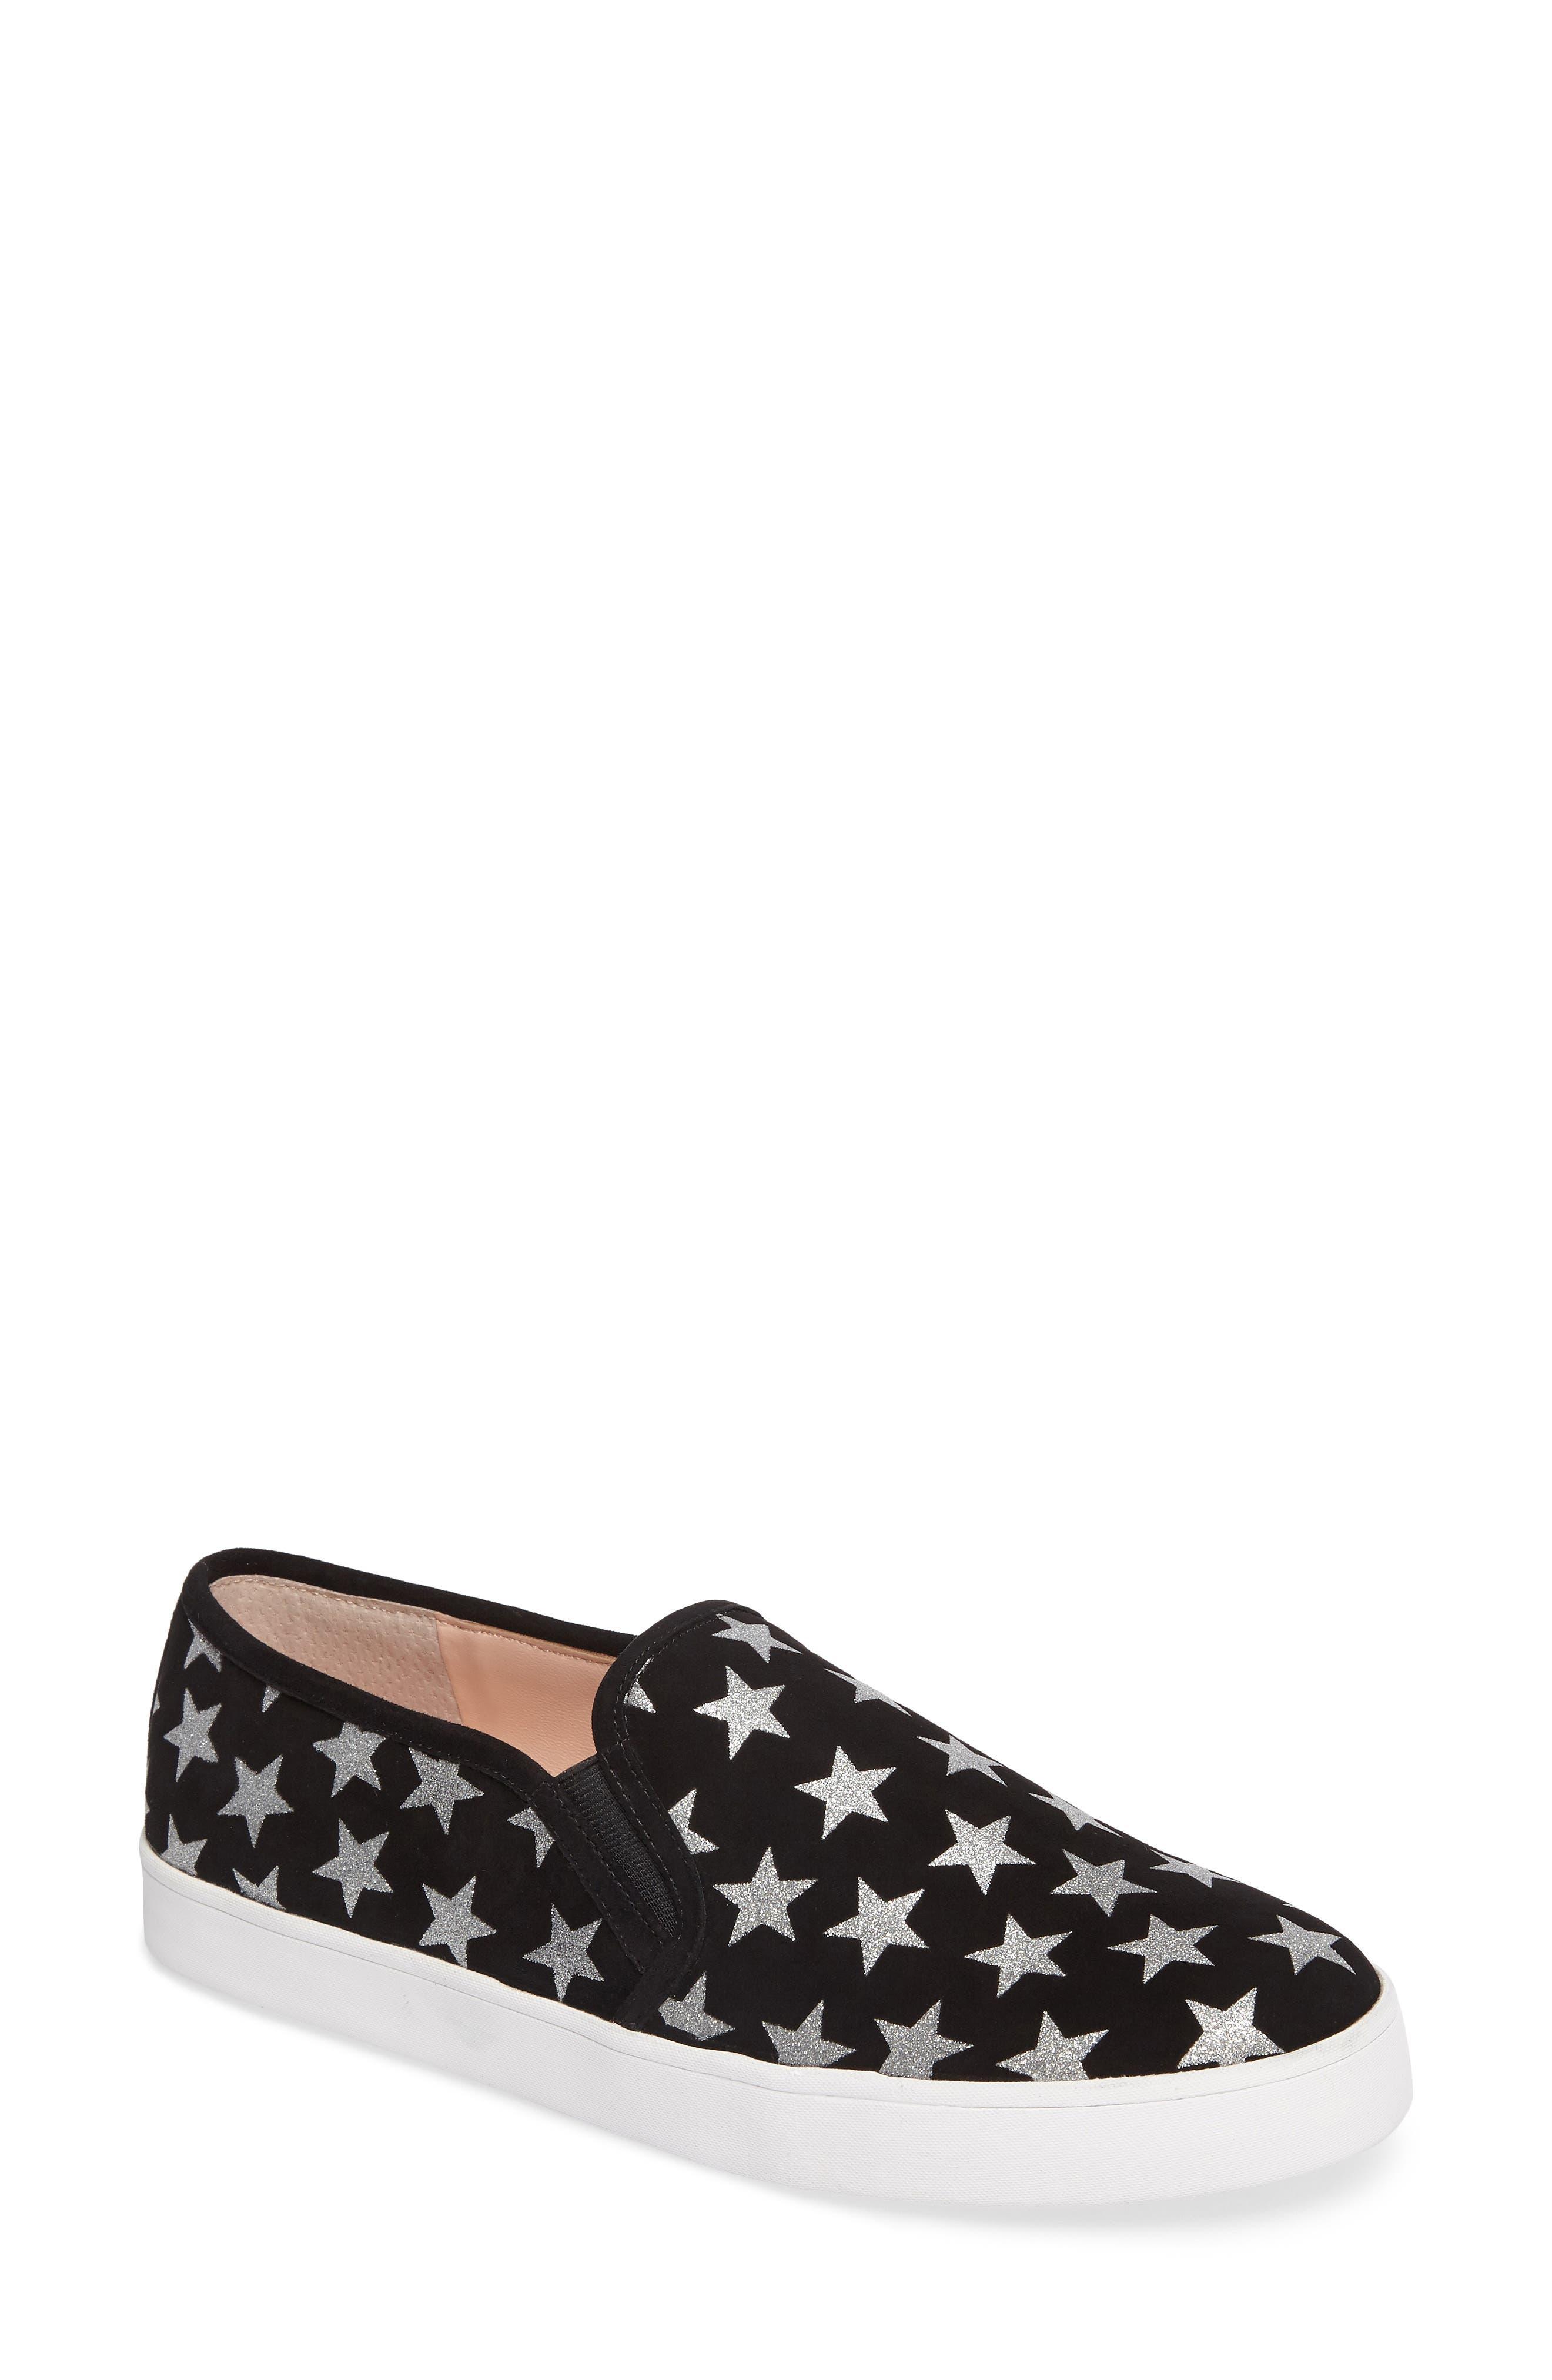 liberty slip-on sneaker,                             Main thumbnail 1, color,                             Black/ Silver